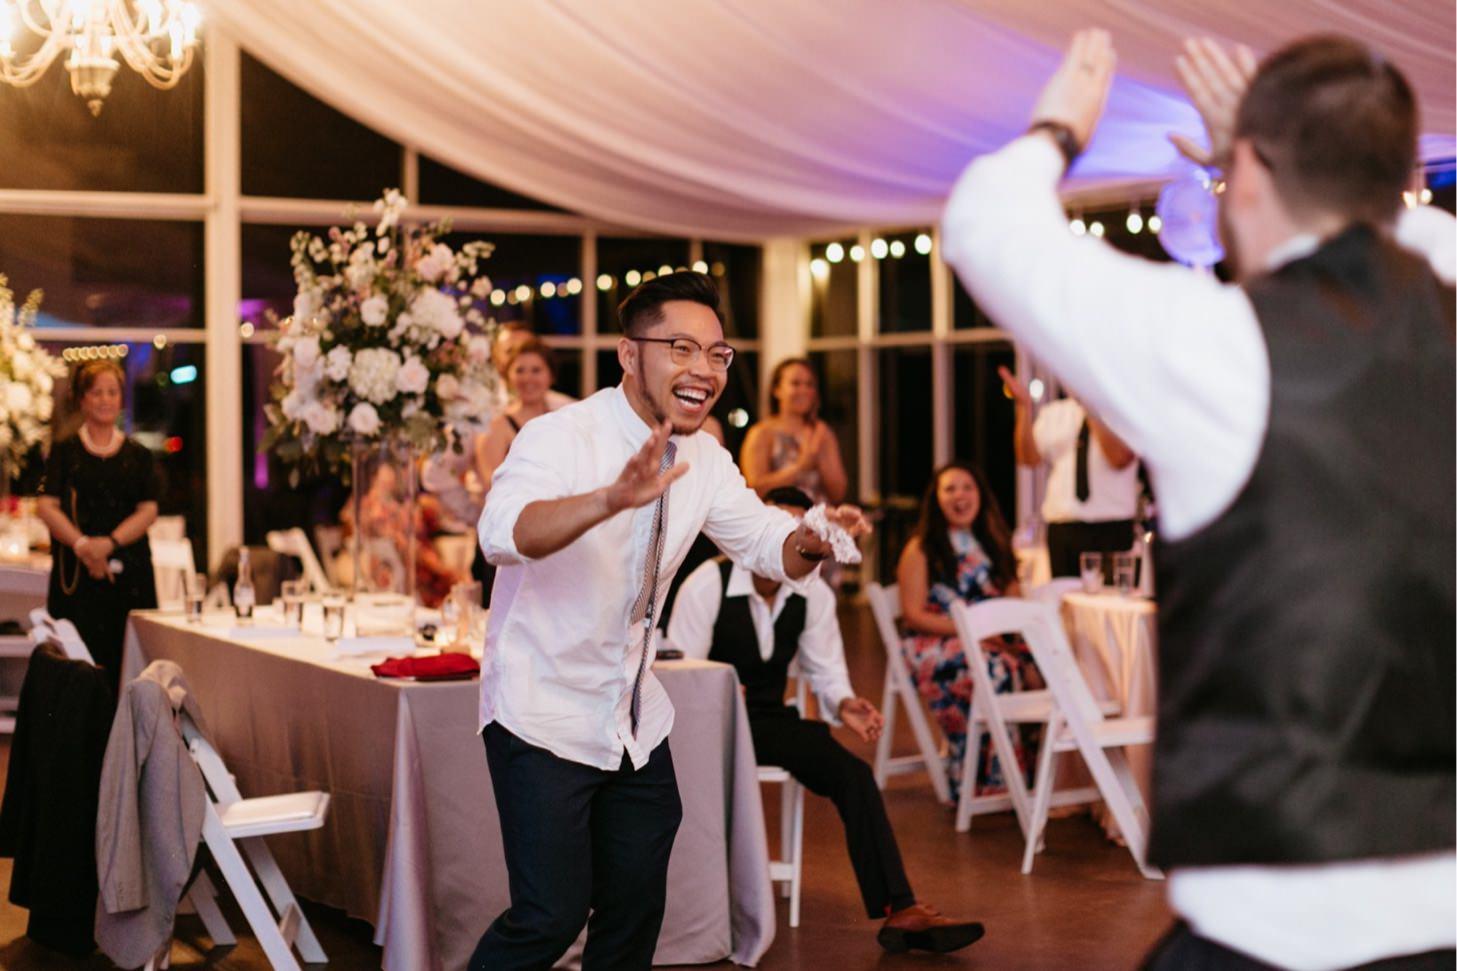 ritz-charles-wedding-reception-downtown-indianapolis-wedding-photographer081.JPG